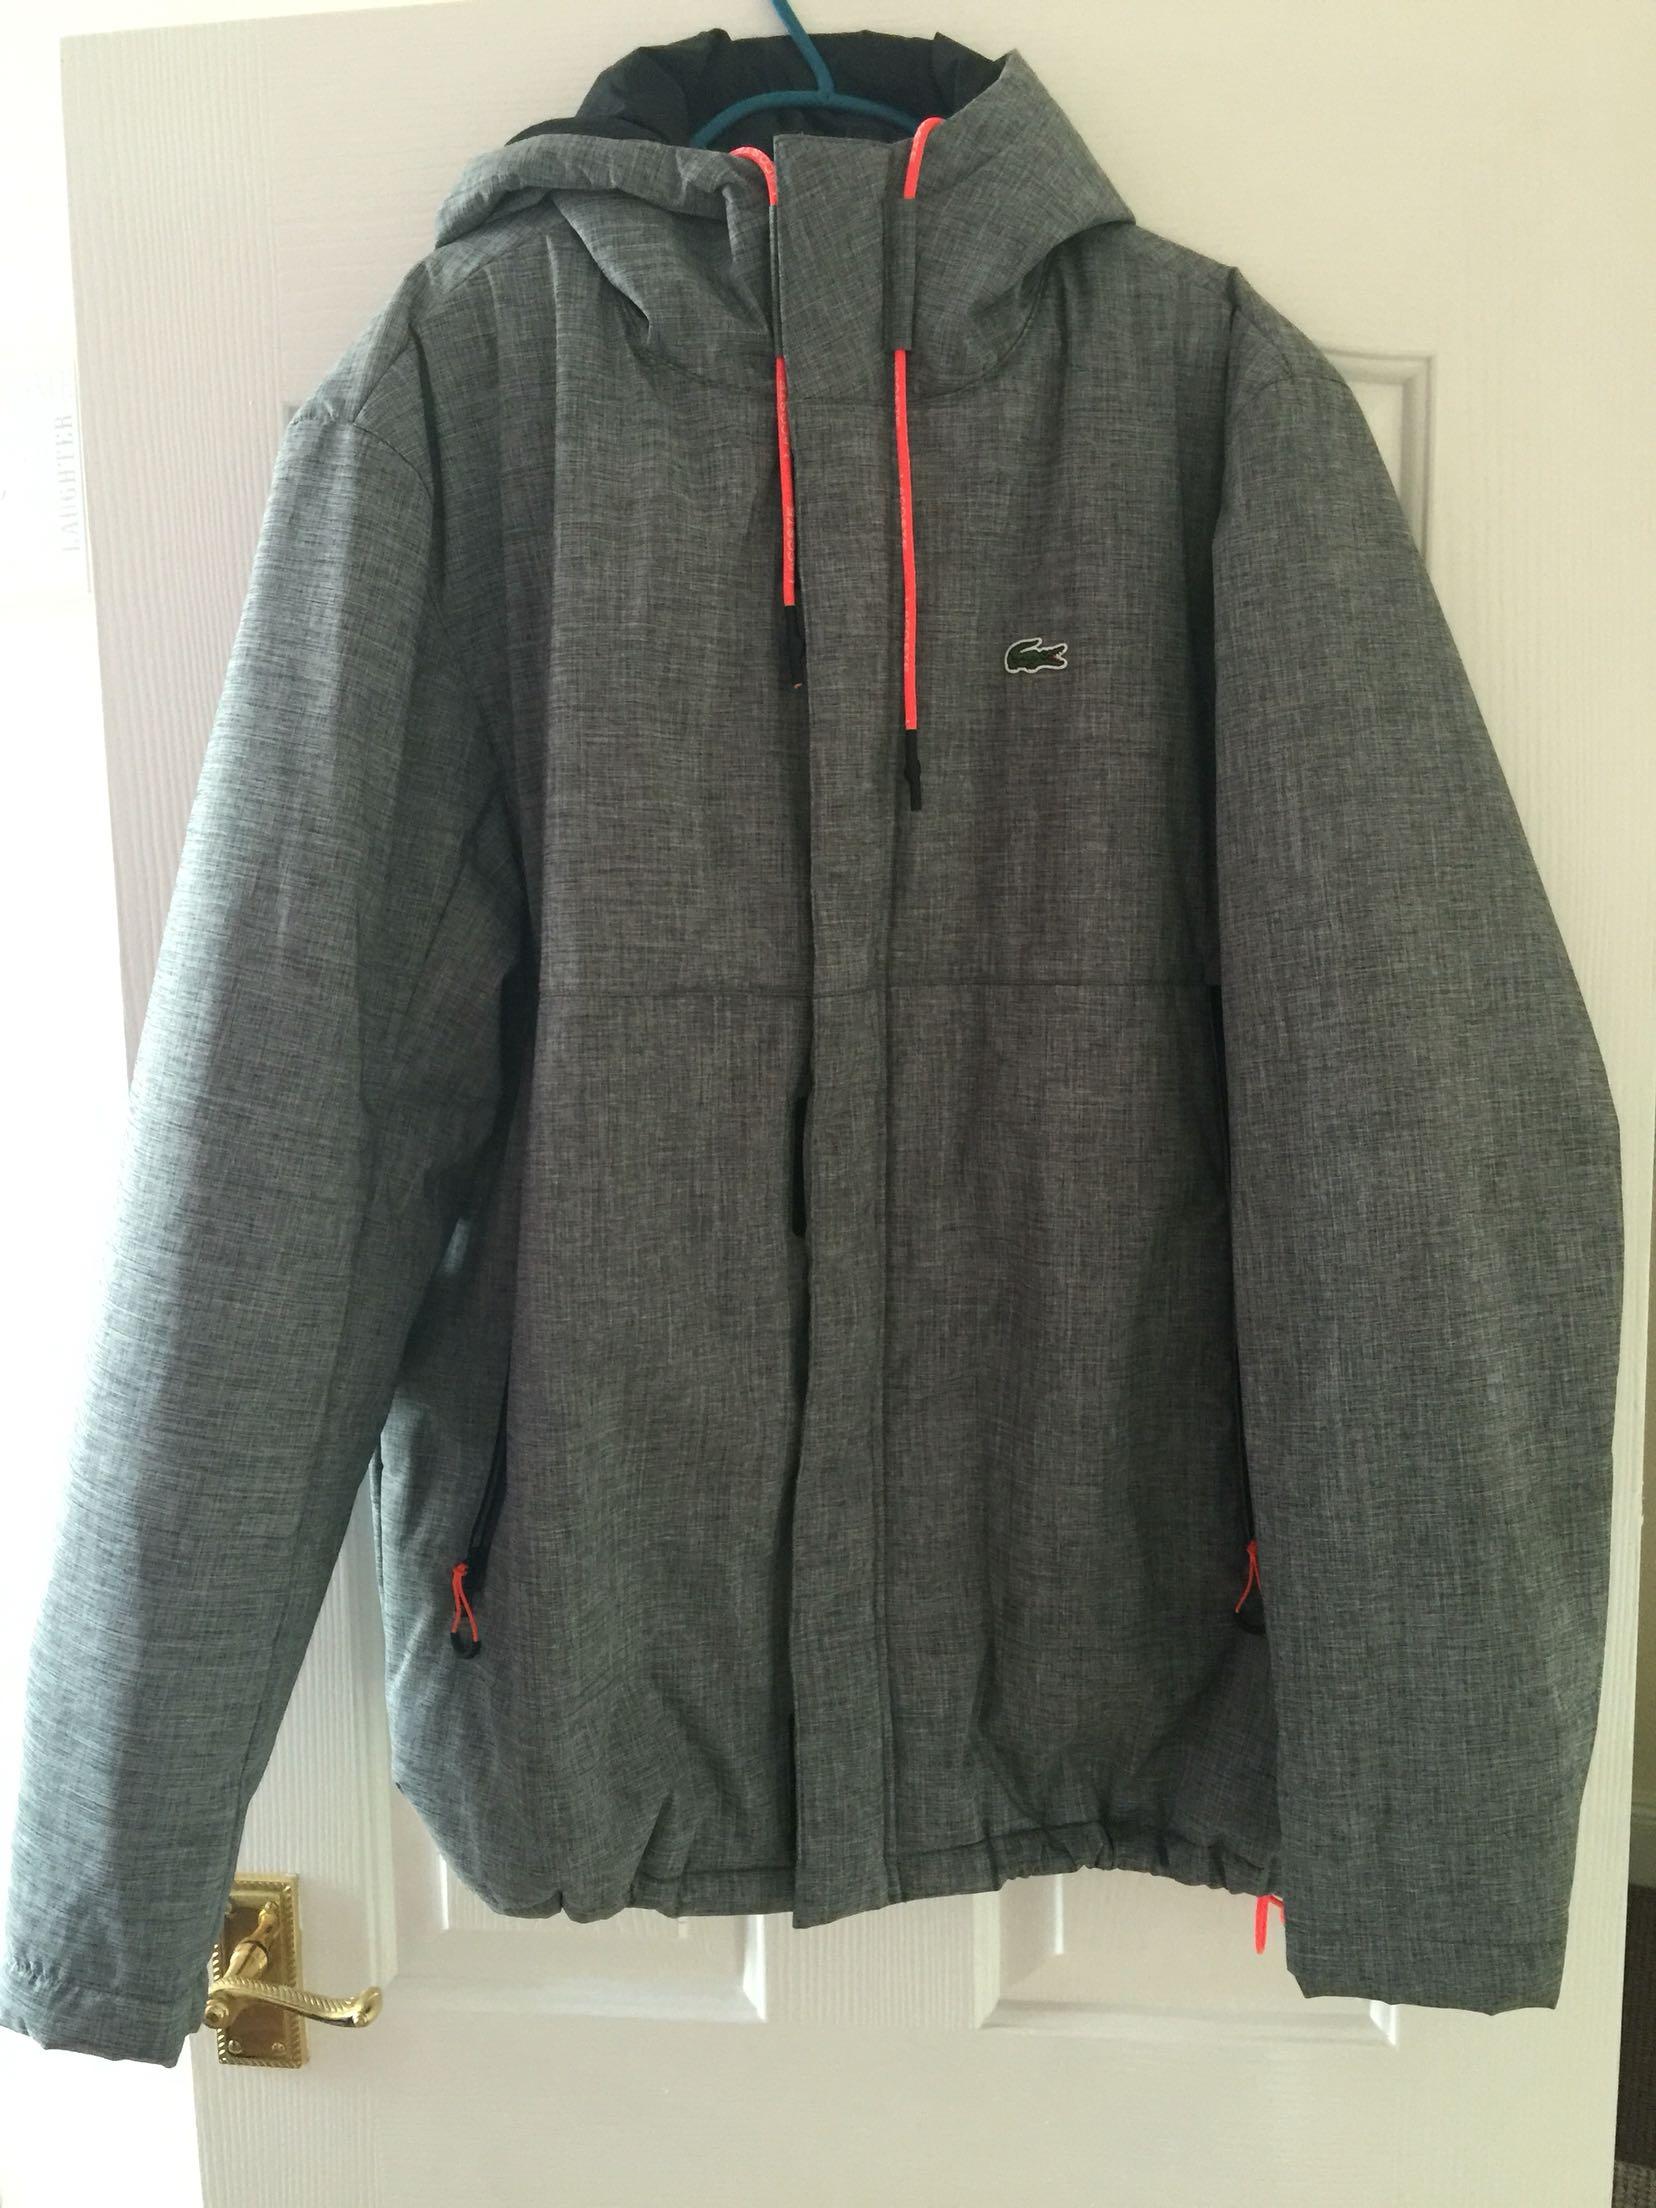 lacoste jacket for sale in uk 133 used lacoste jackets. Black Bedroom Furniture Sets. Home Design Ideas